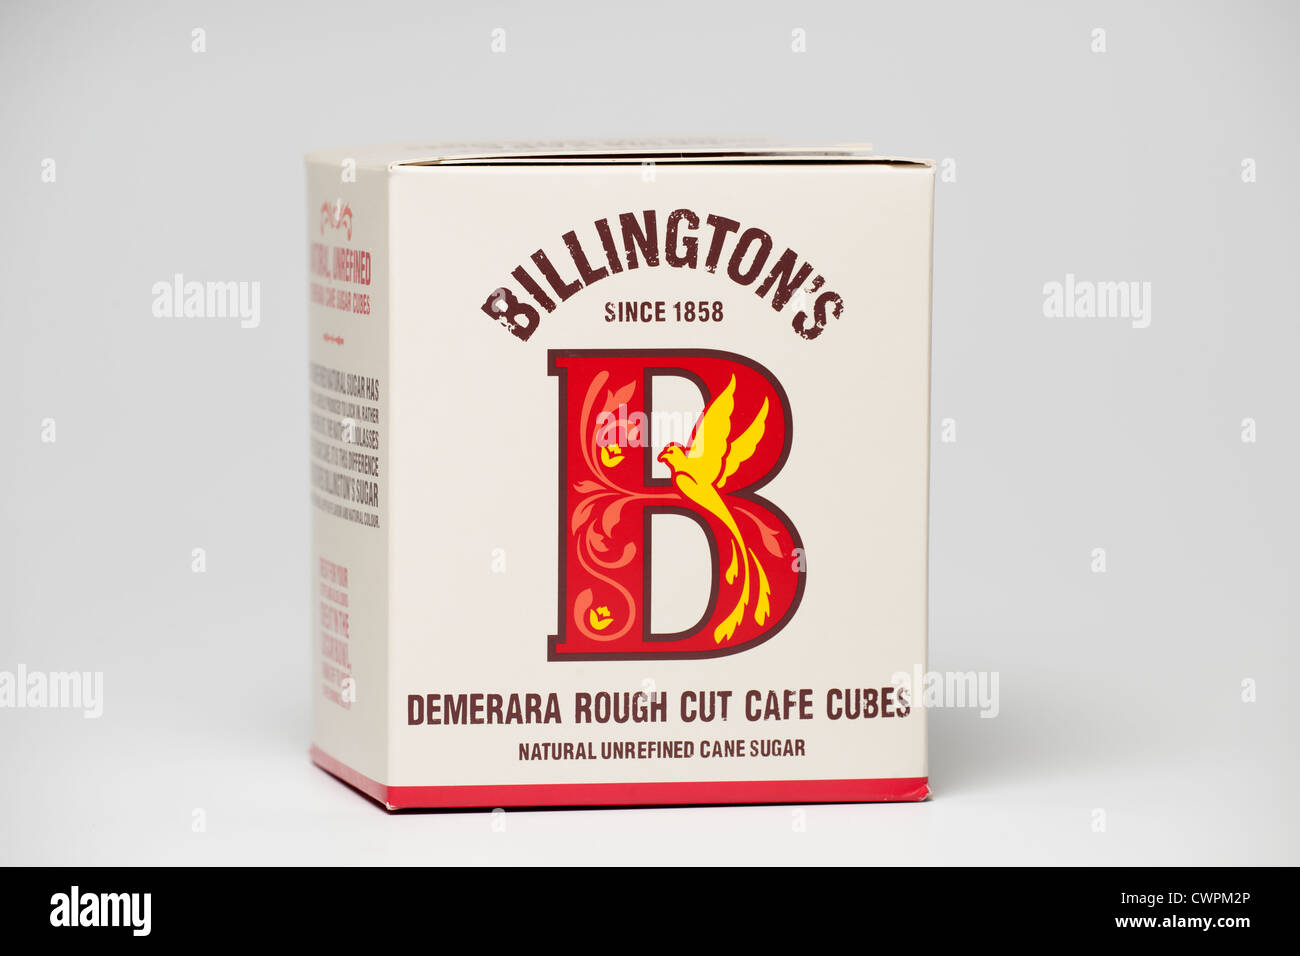 Scatola di naturale Billingtons grezzo di canna Demerara Rough cut cafe cubi Immagini Stock